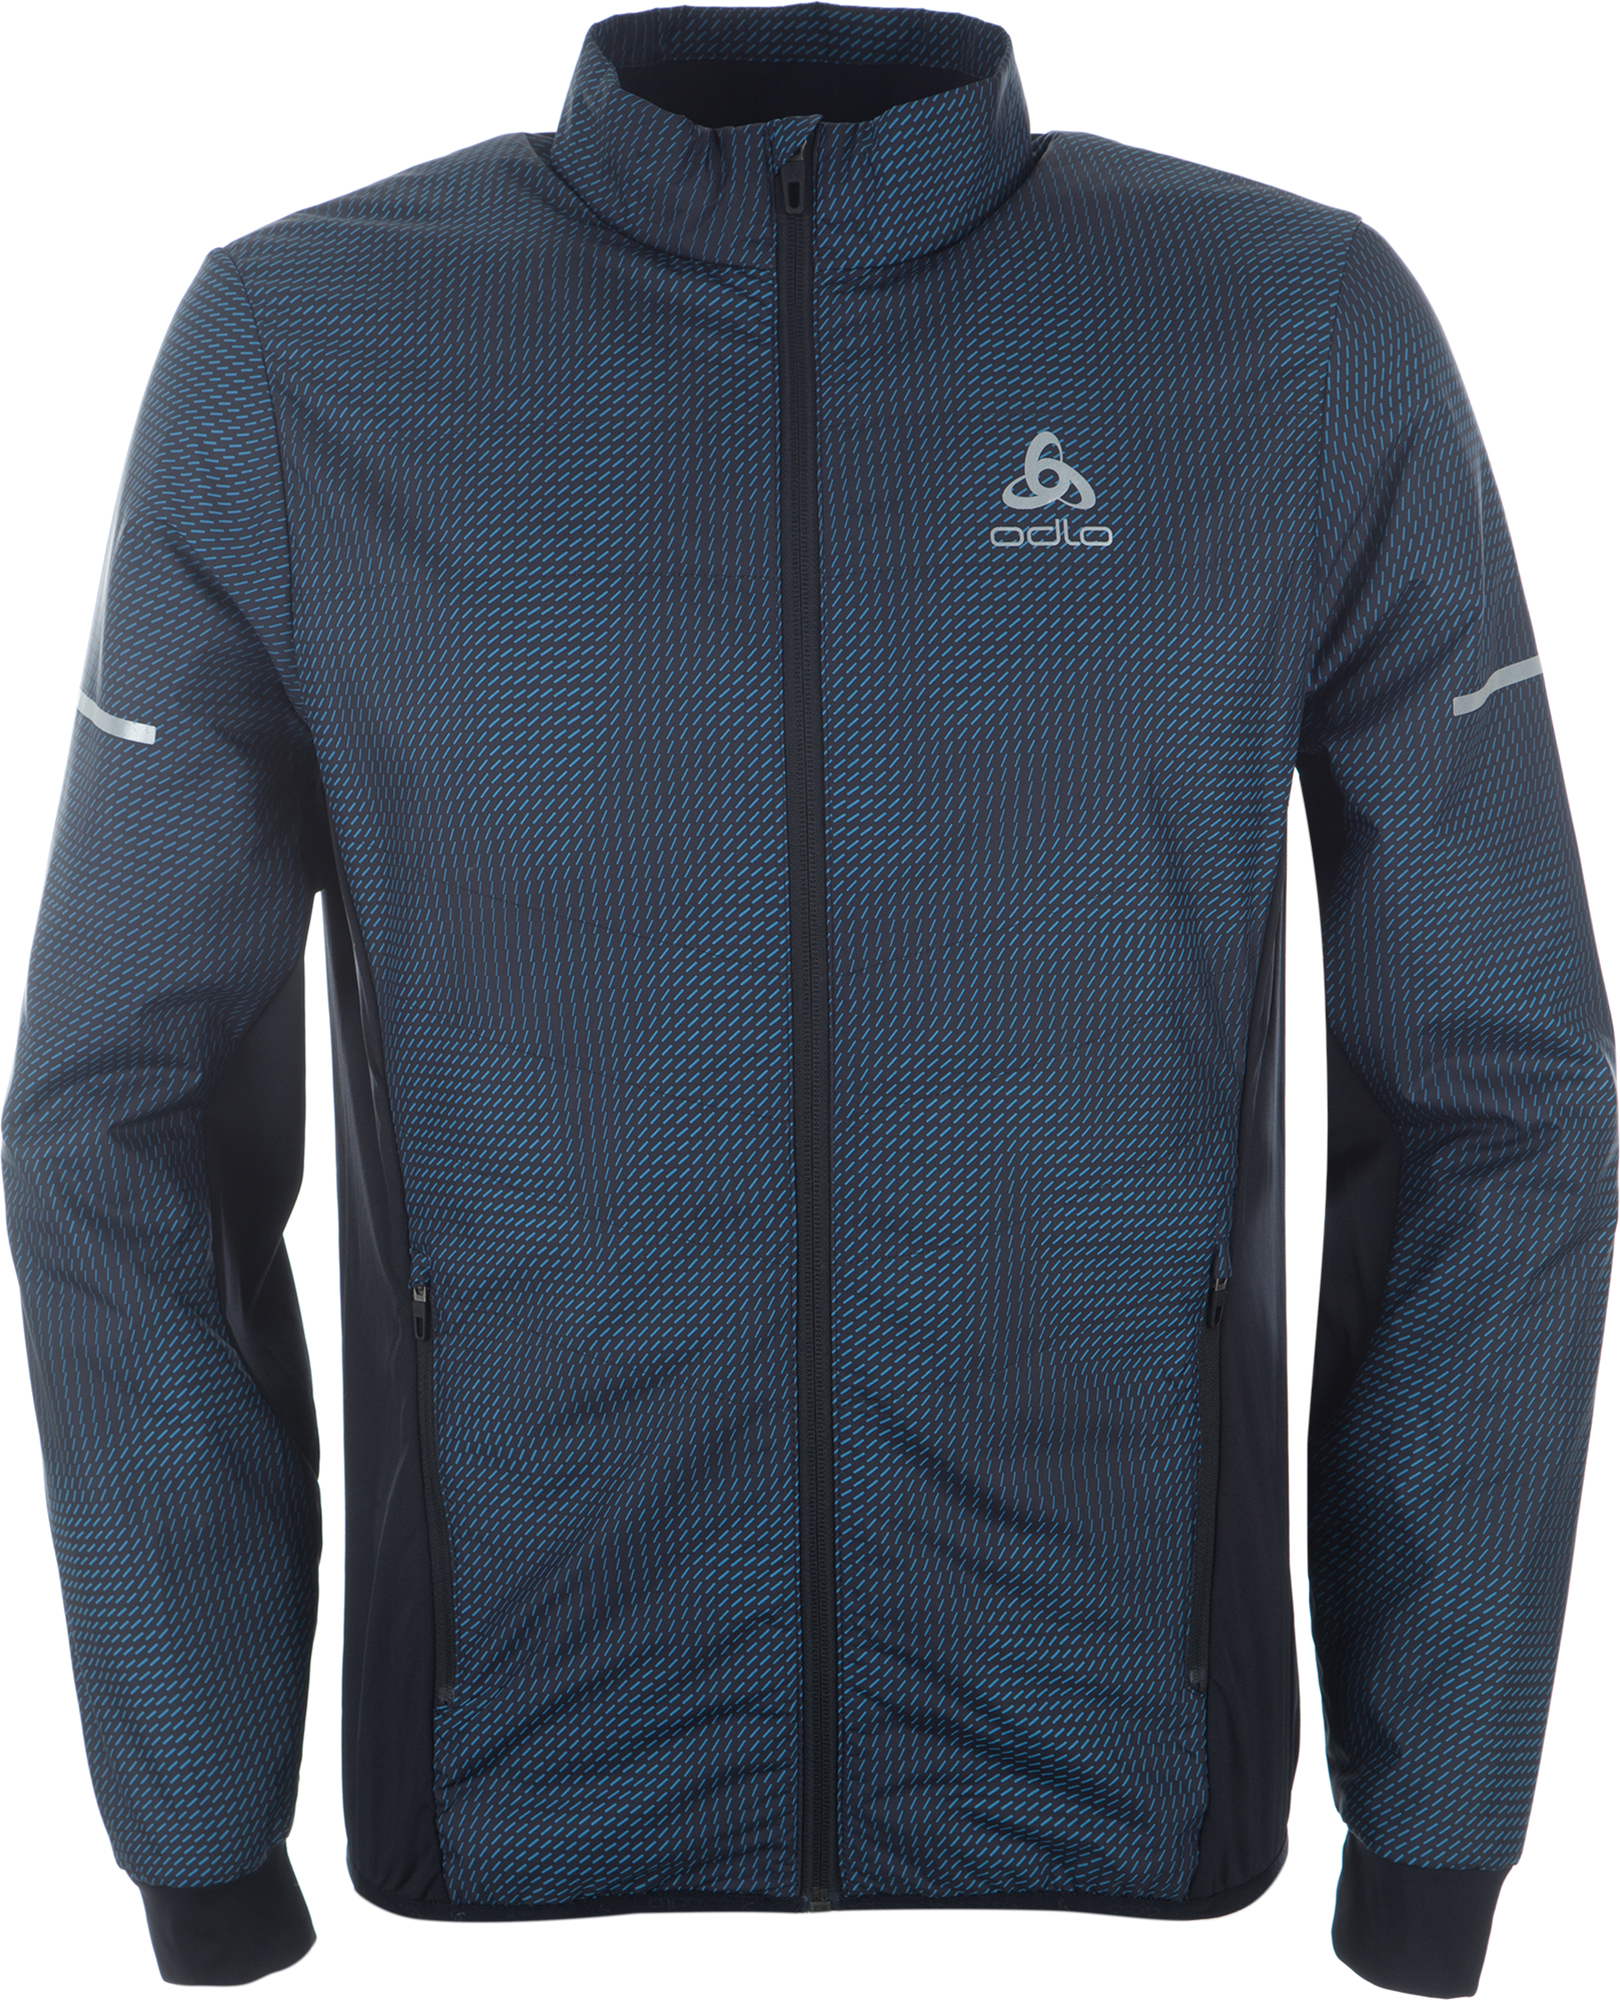 Odlo Куртка утепленная мужская Irbis X-Warm, размер 46-48